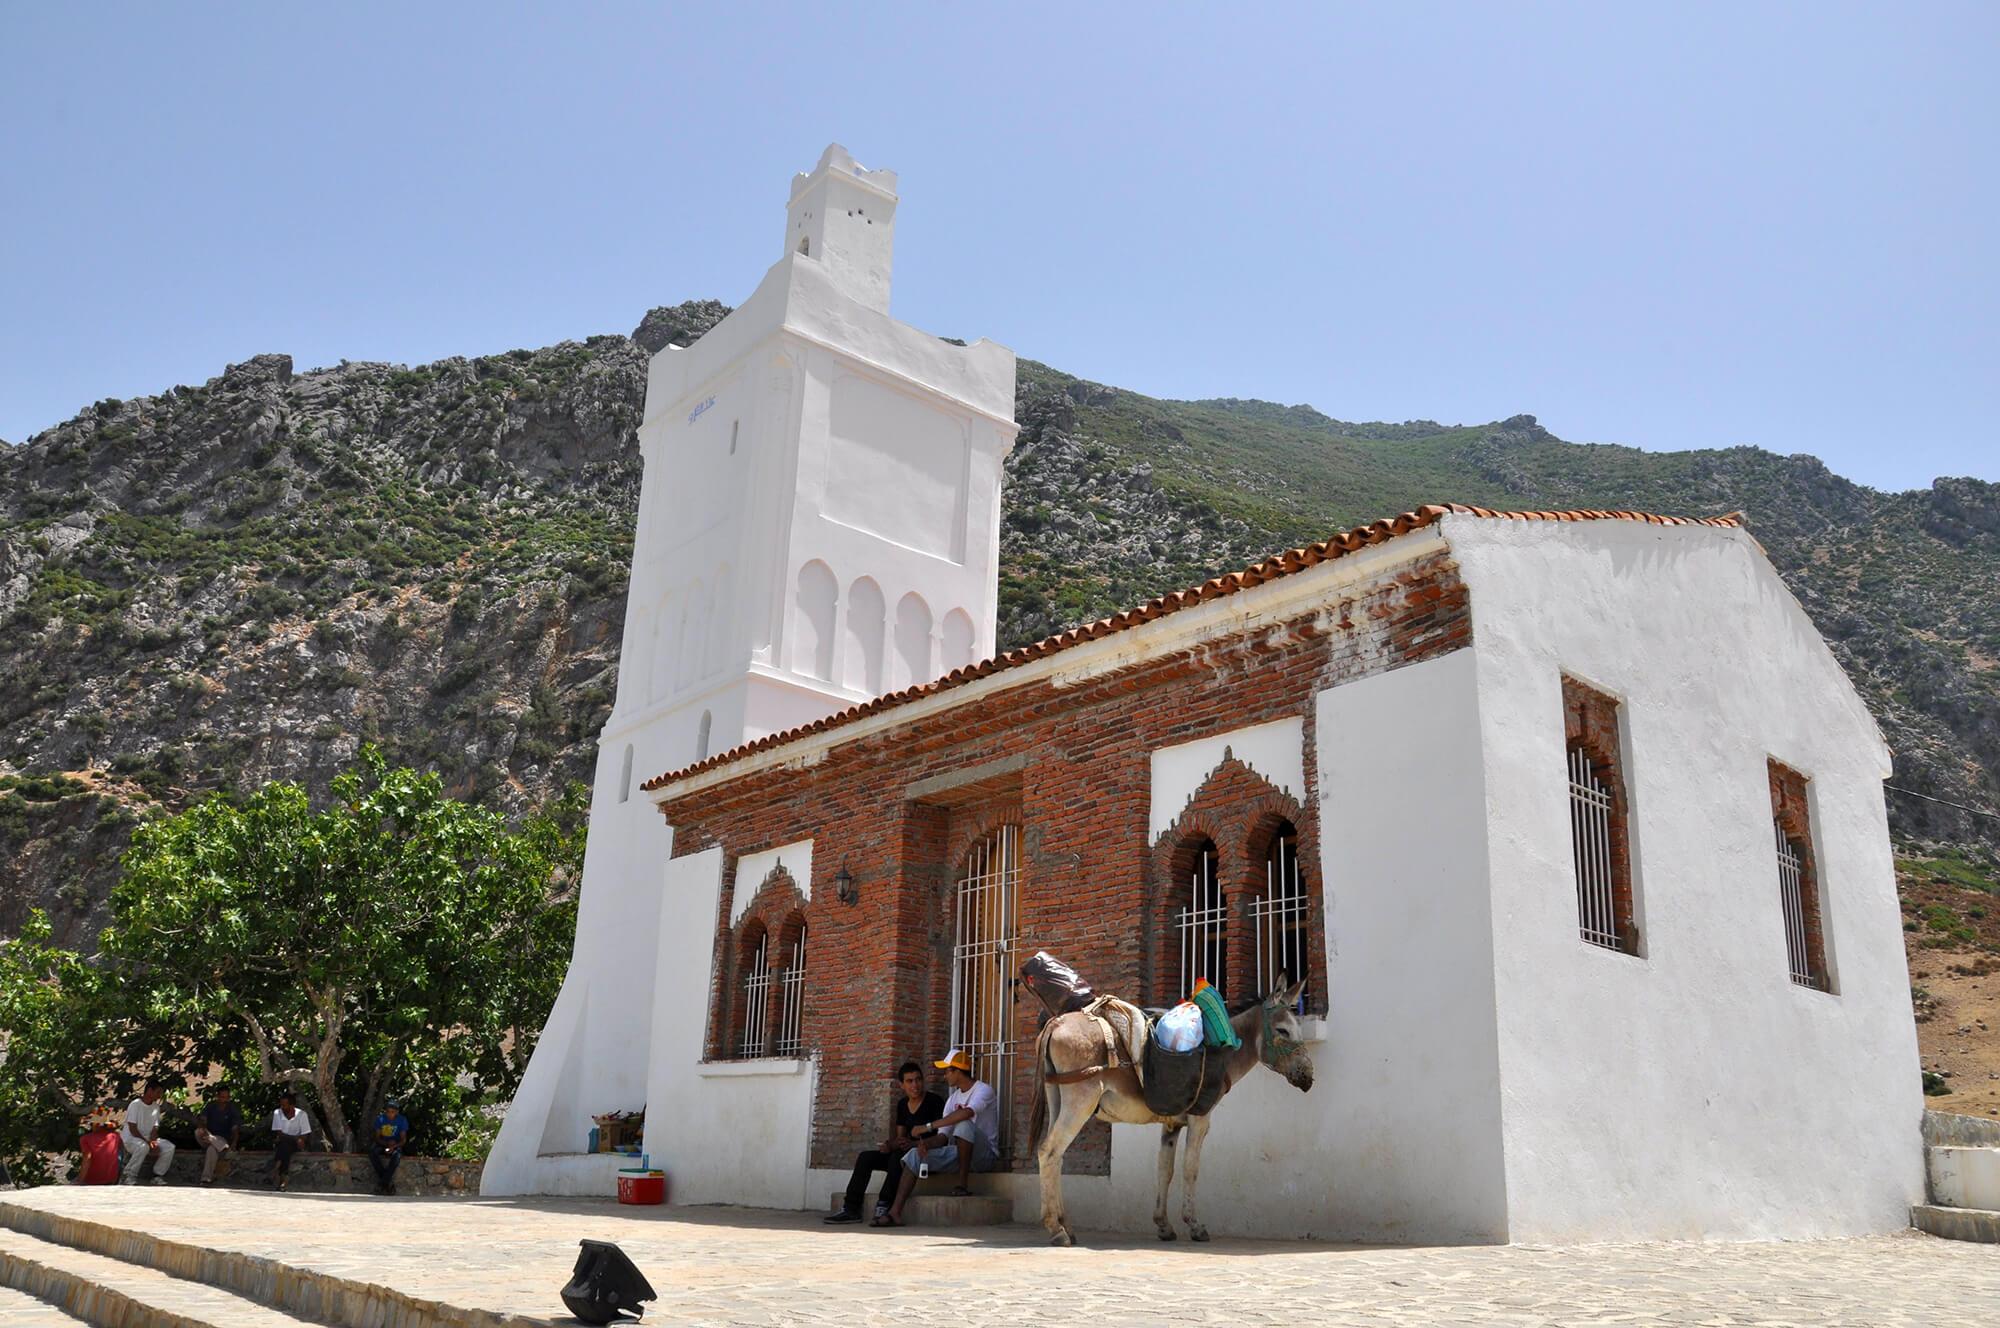 Sahara Desert Tour - Sightseeing in and around Chefchaouen - Visit Bouzaafar (Spanish Mosque)